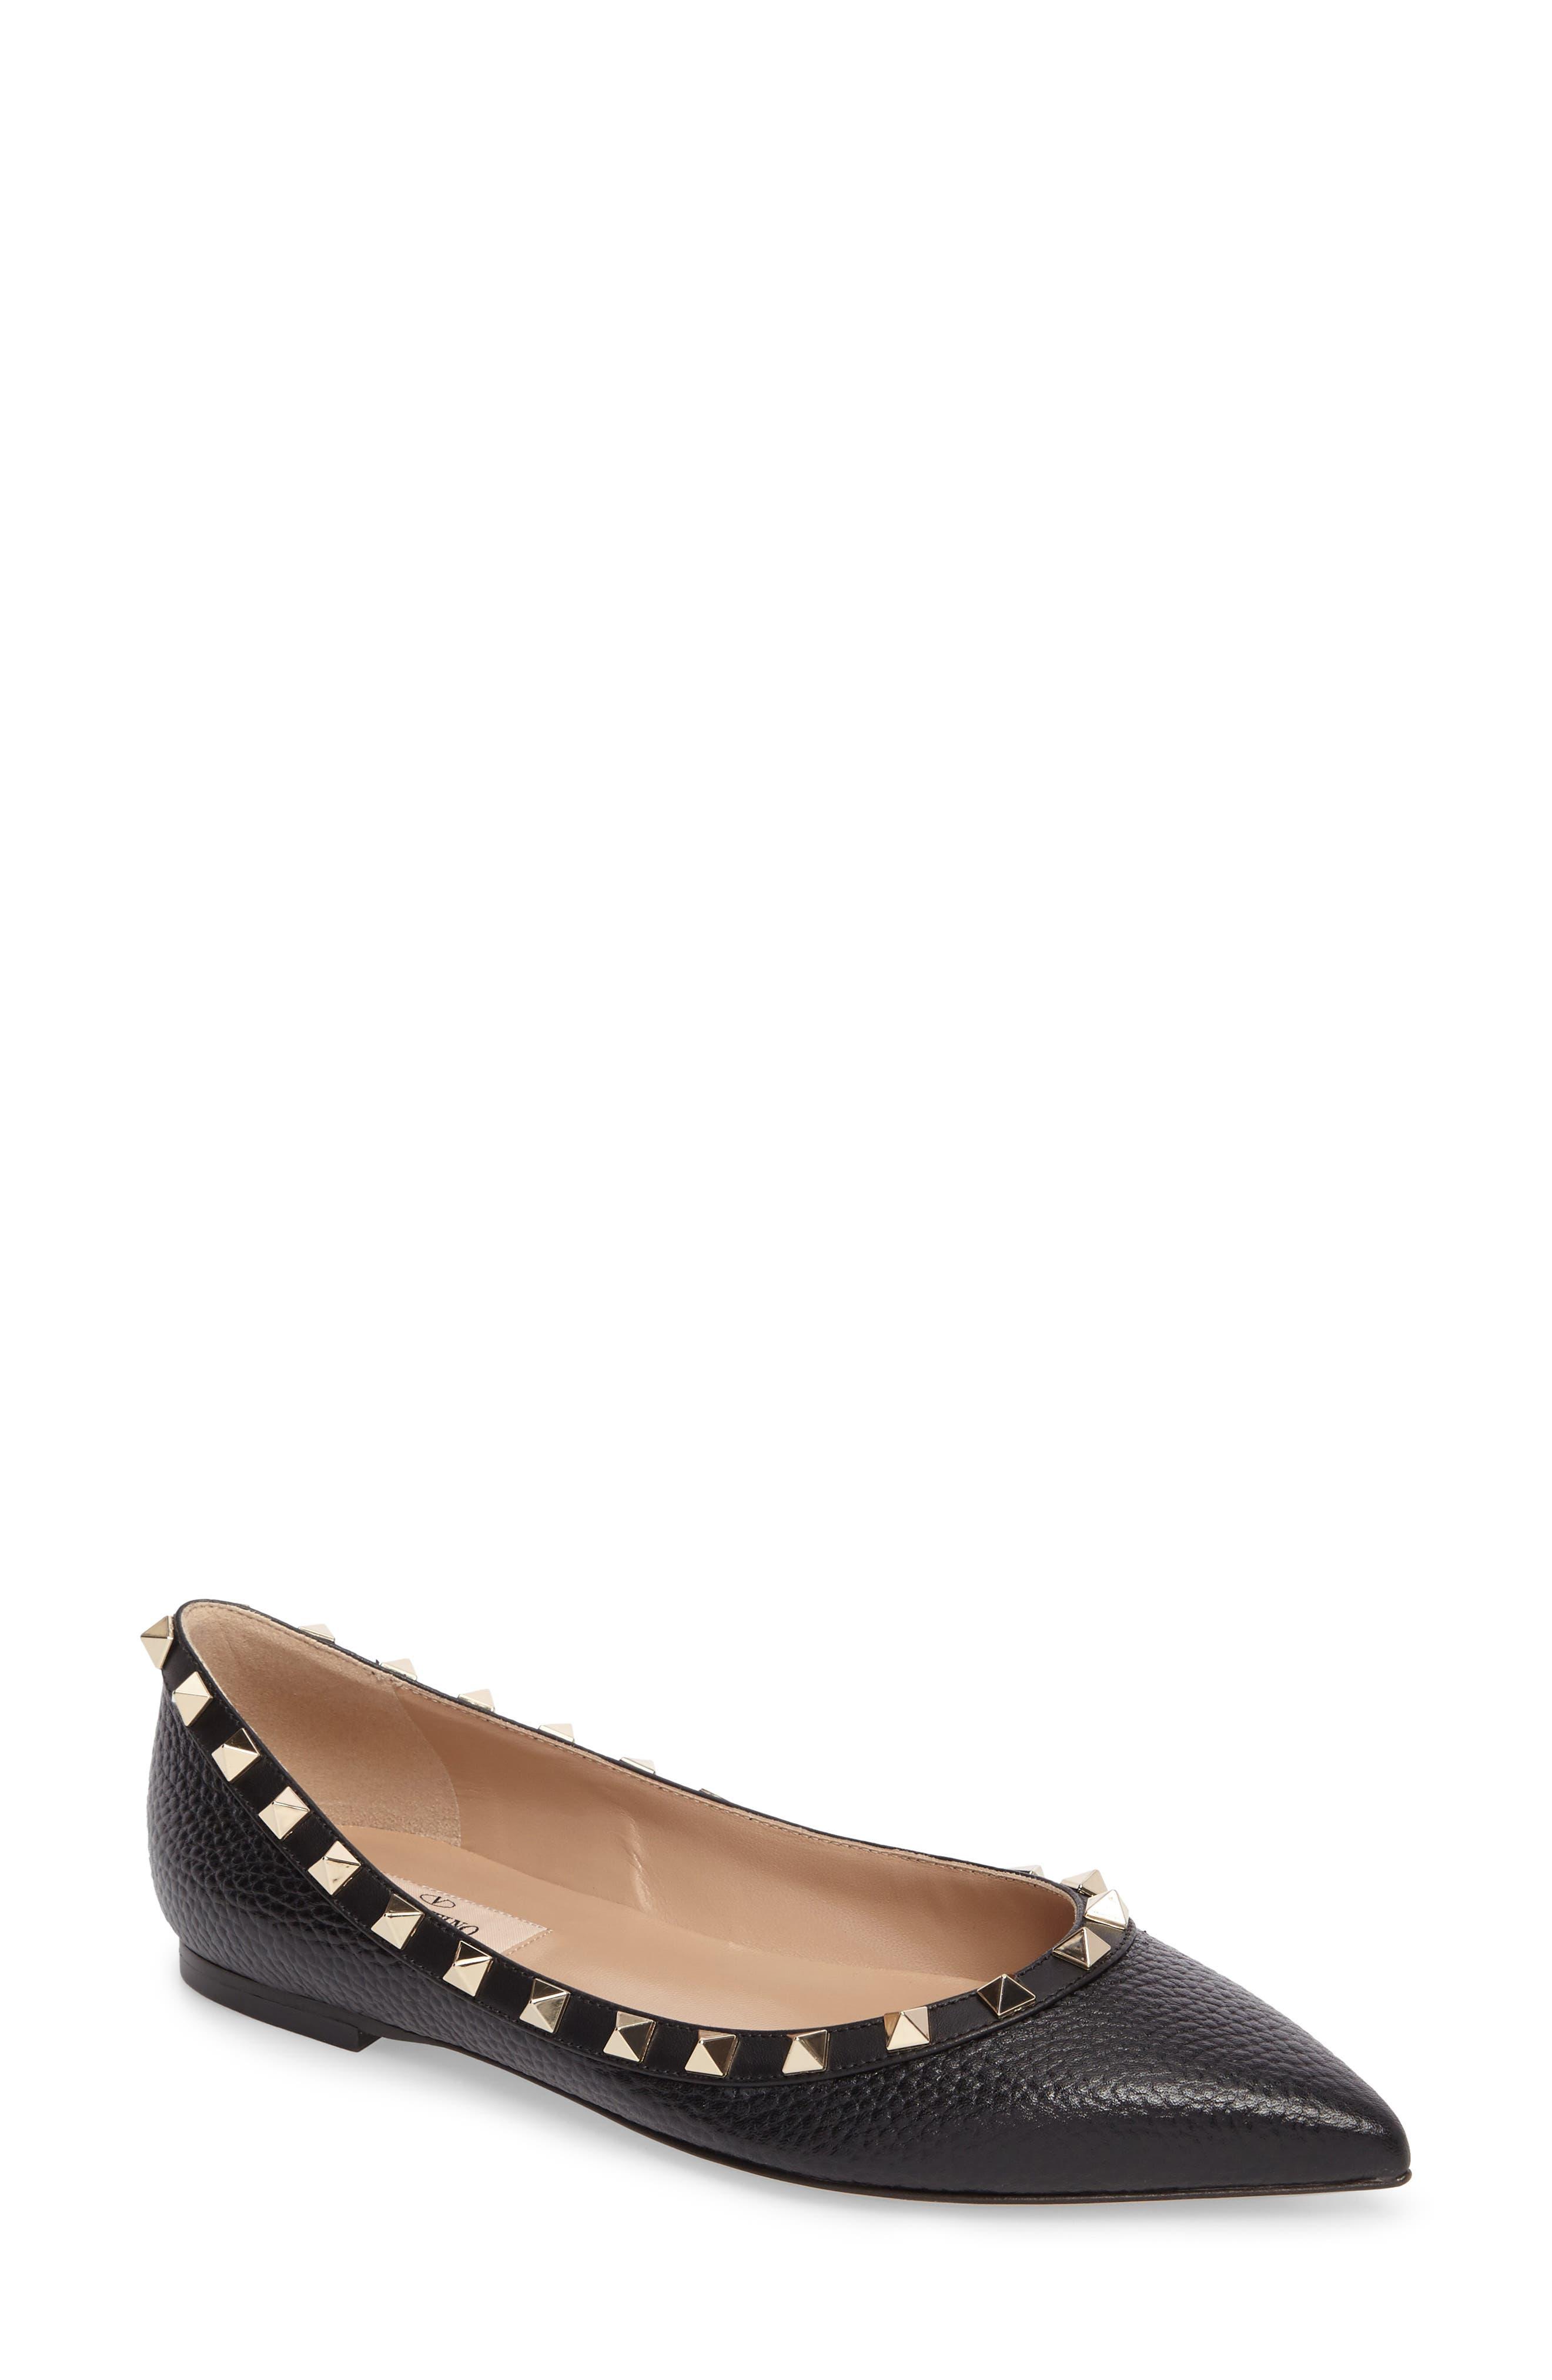 VALENTINO GARAVANI Rockstud Pointy Toe Flat (Women)